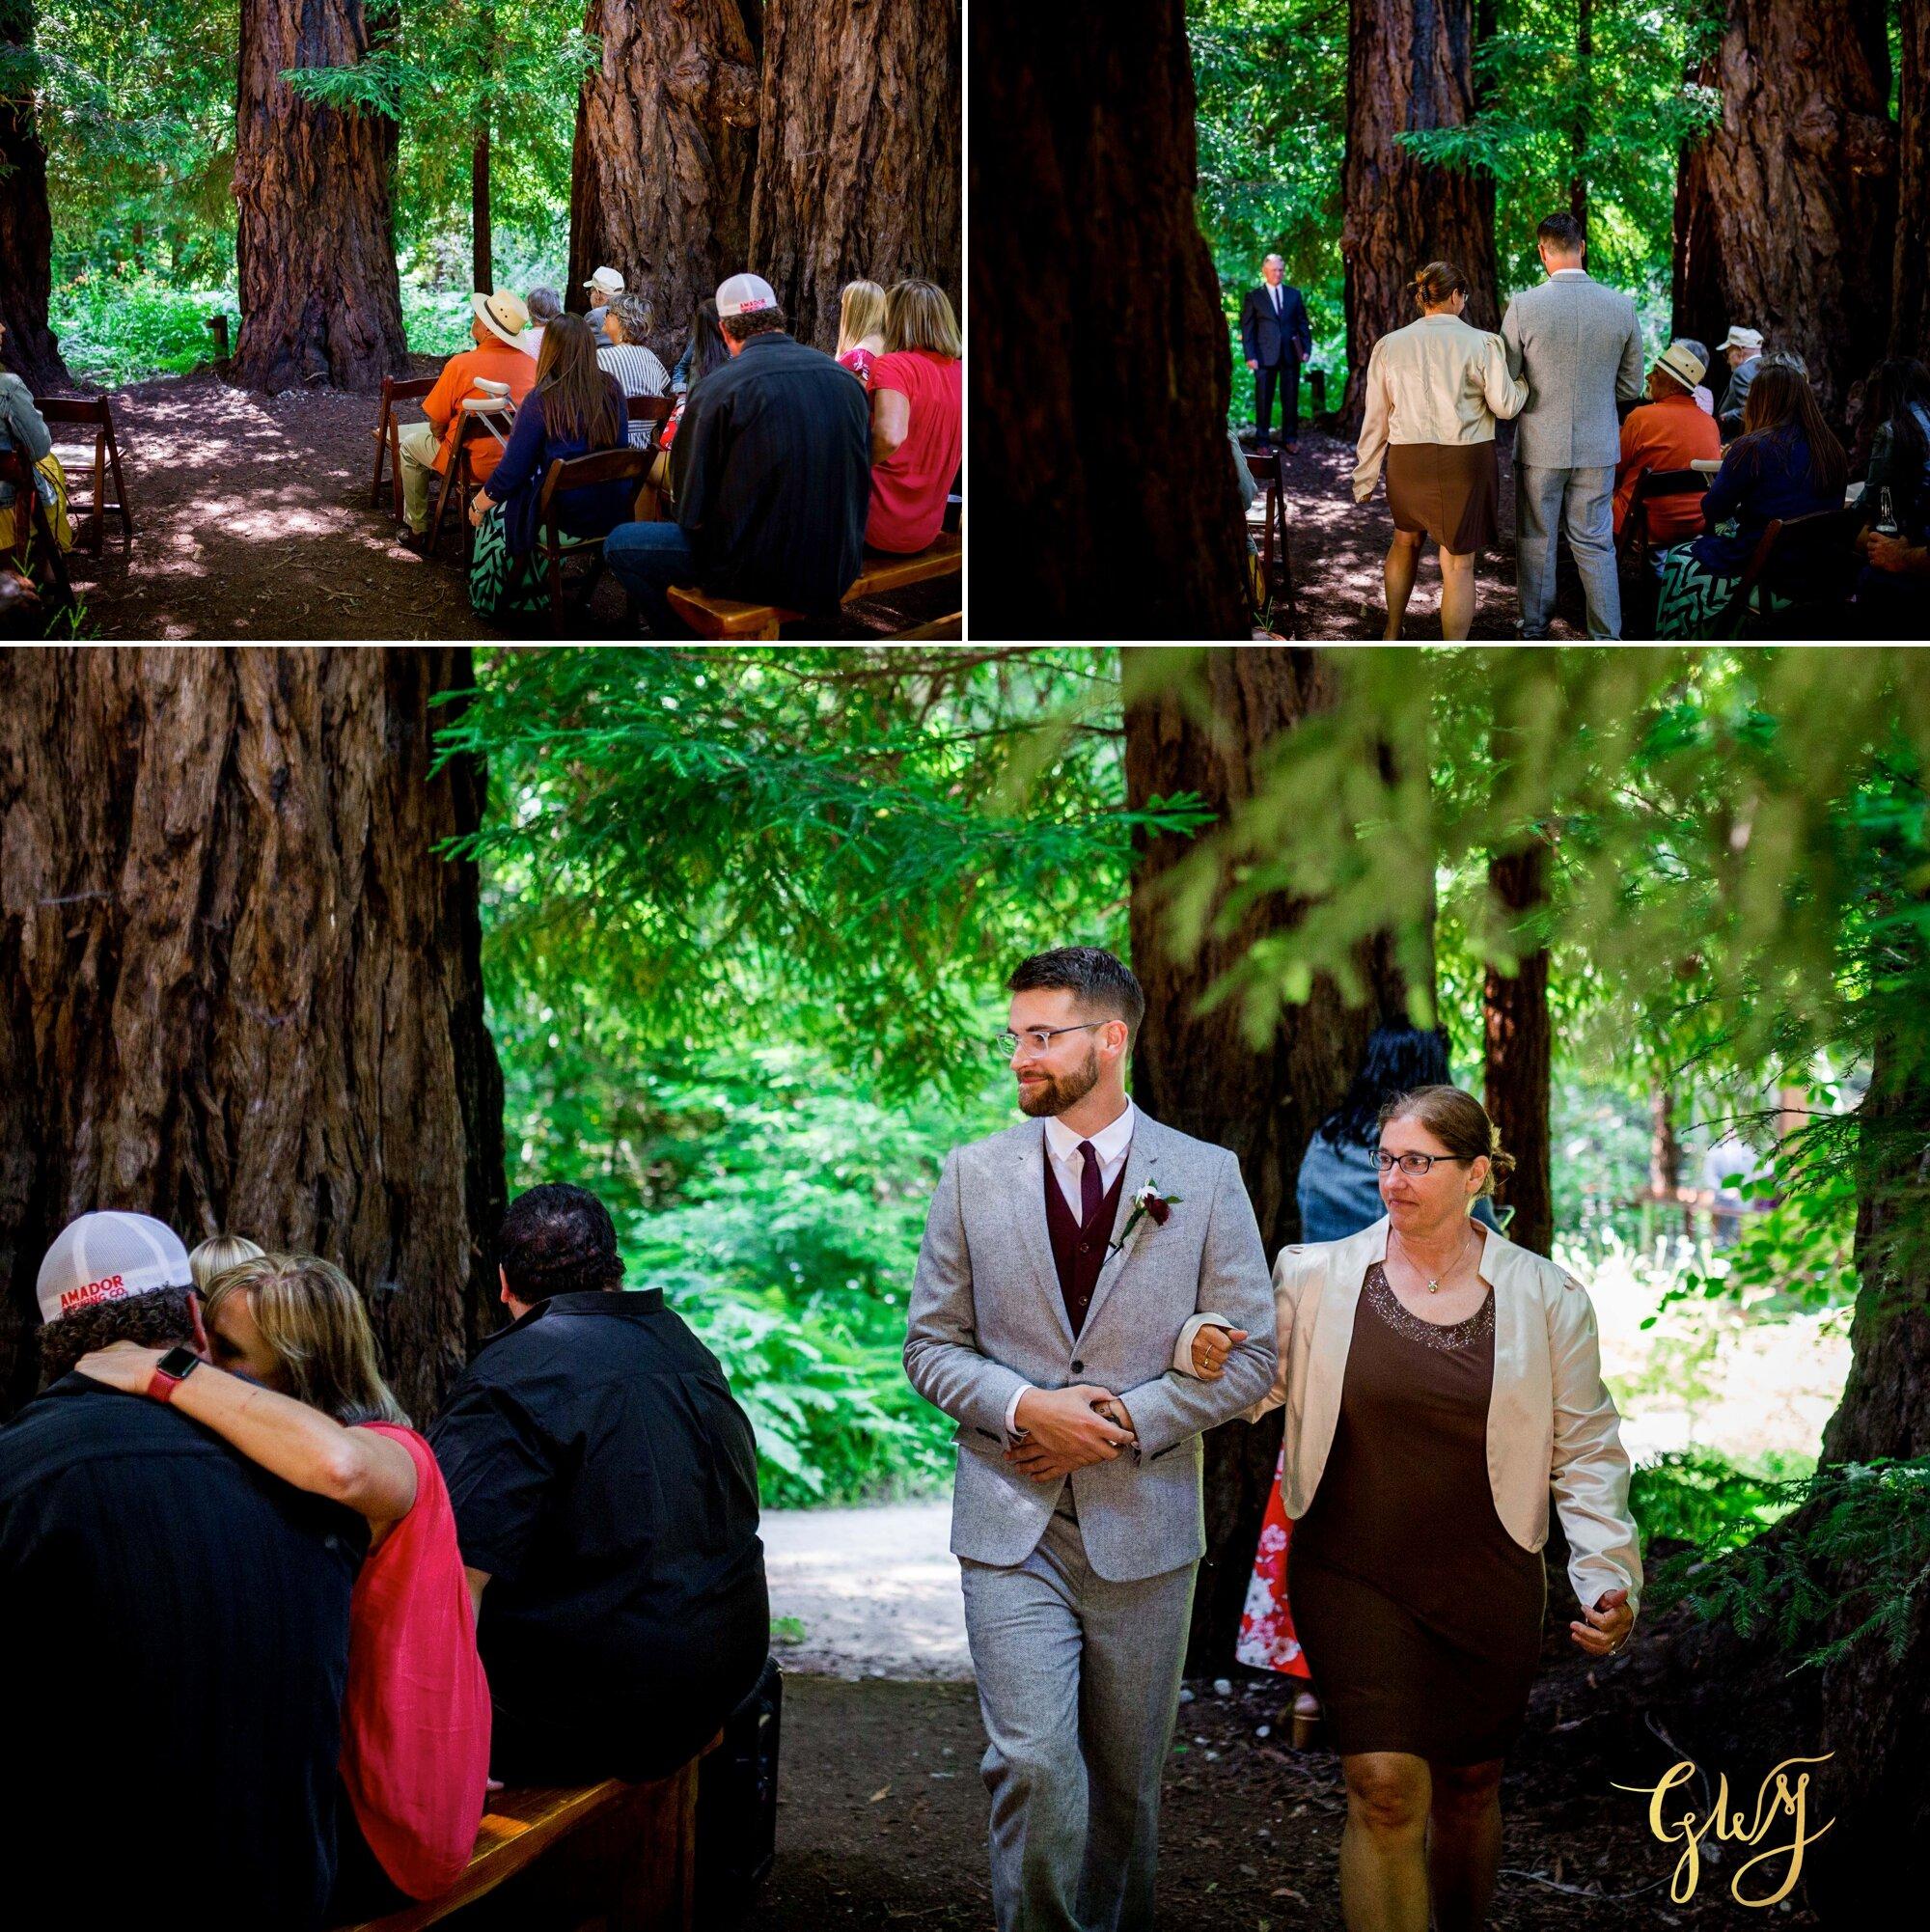 Casey + Jordan's Intimate Big Sur Elopement in the Redwoods by Glass Woods Media 31.jpg